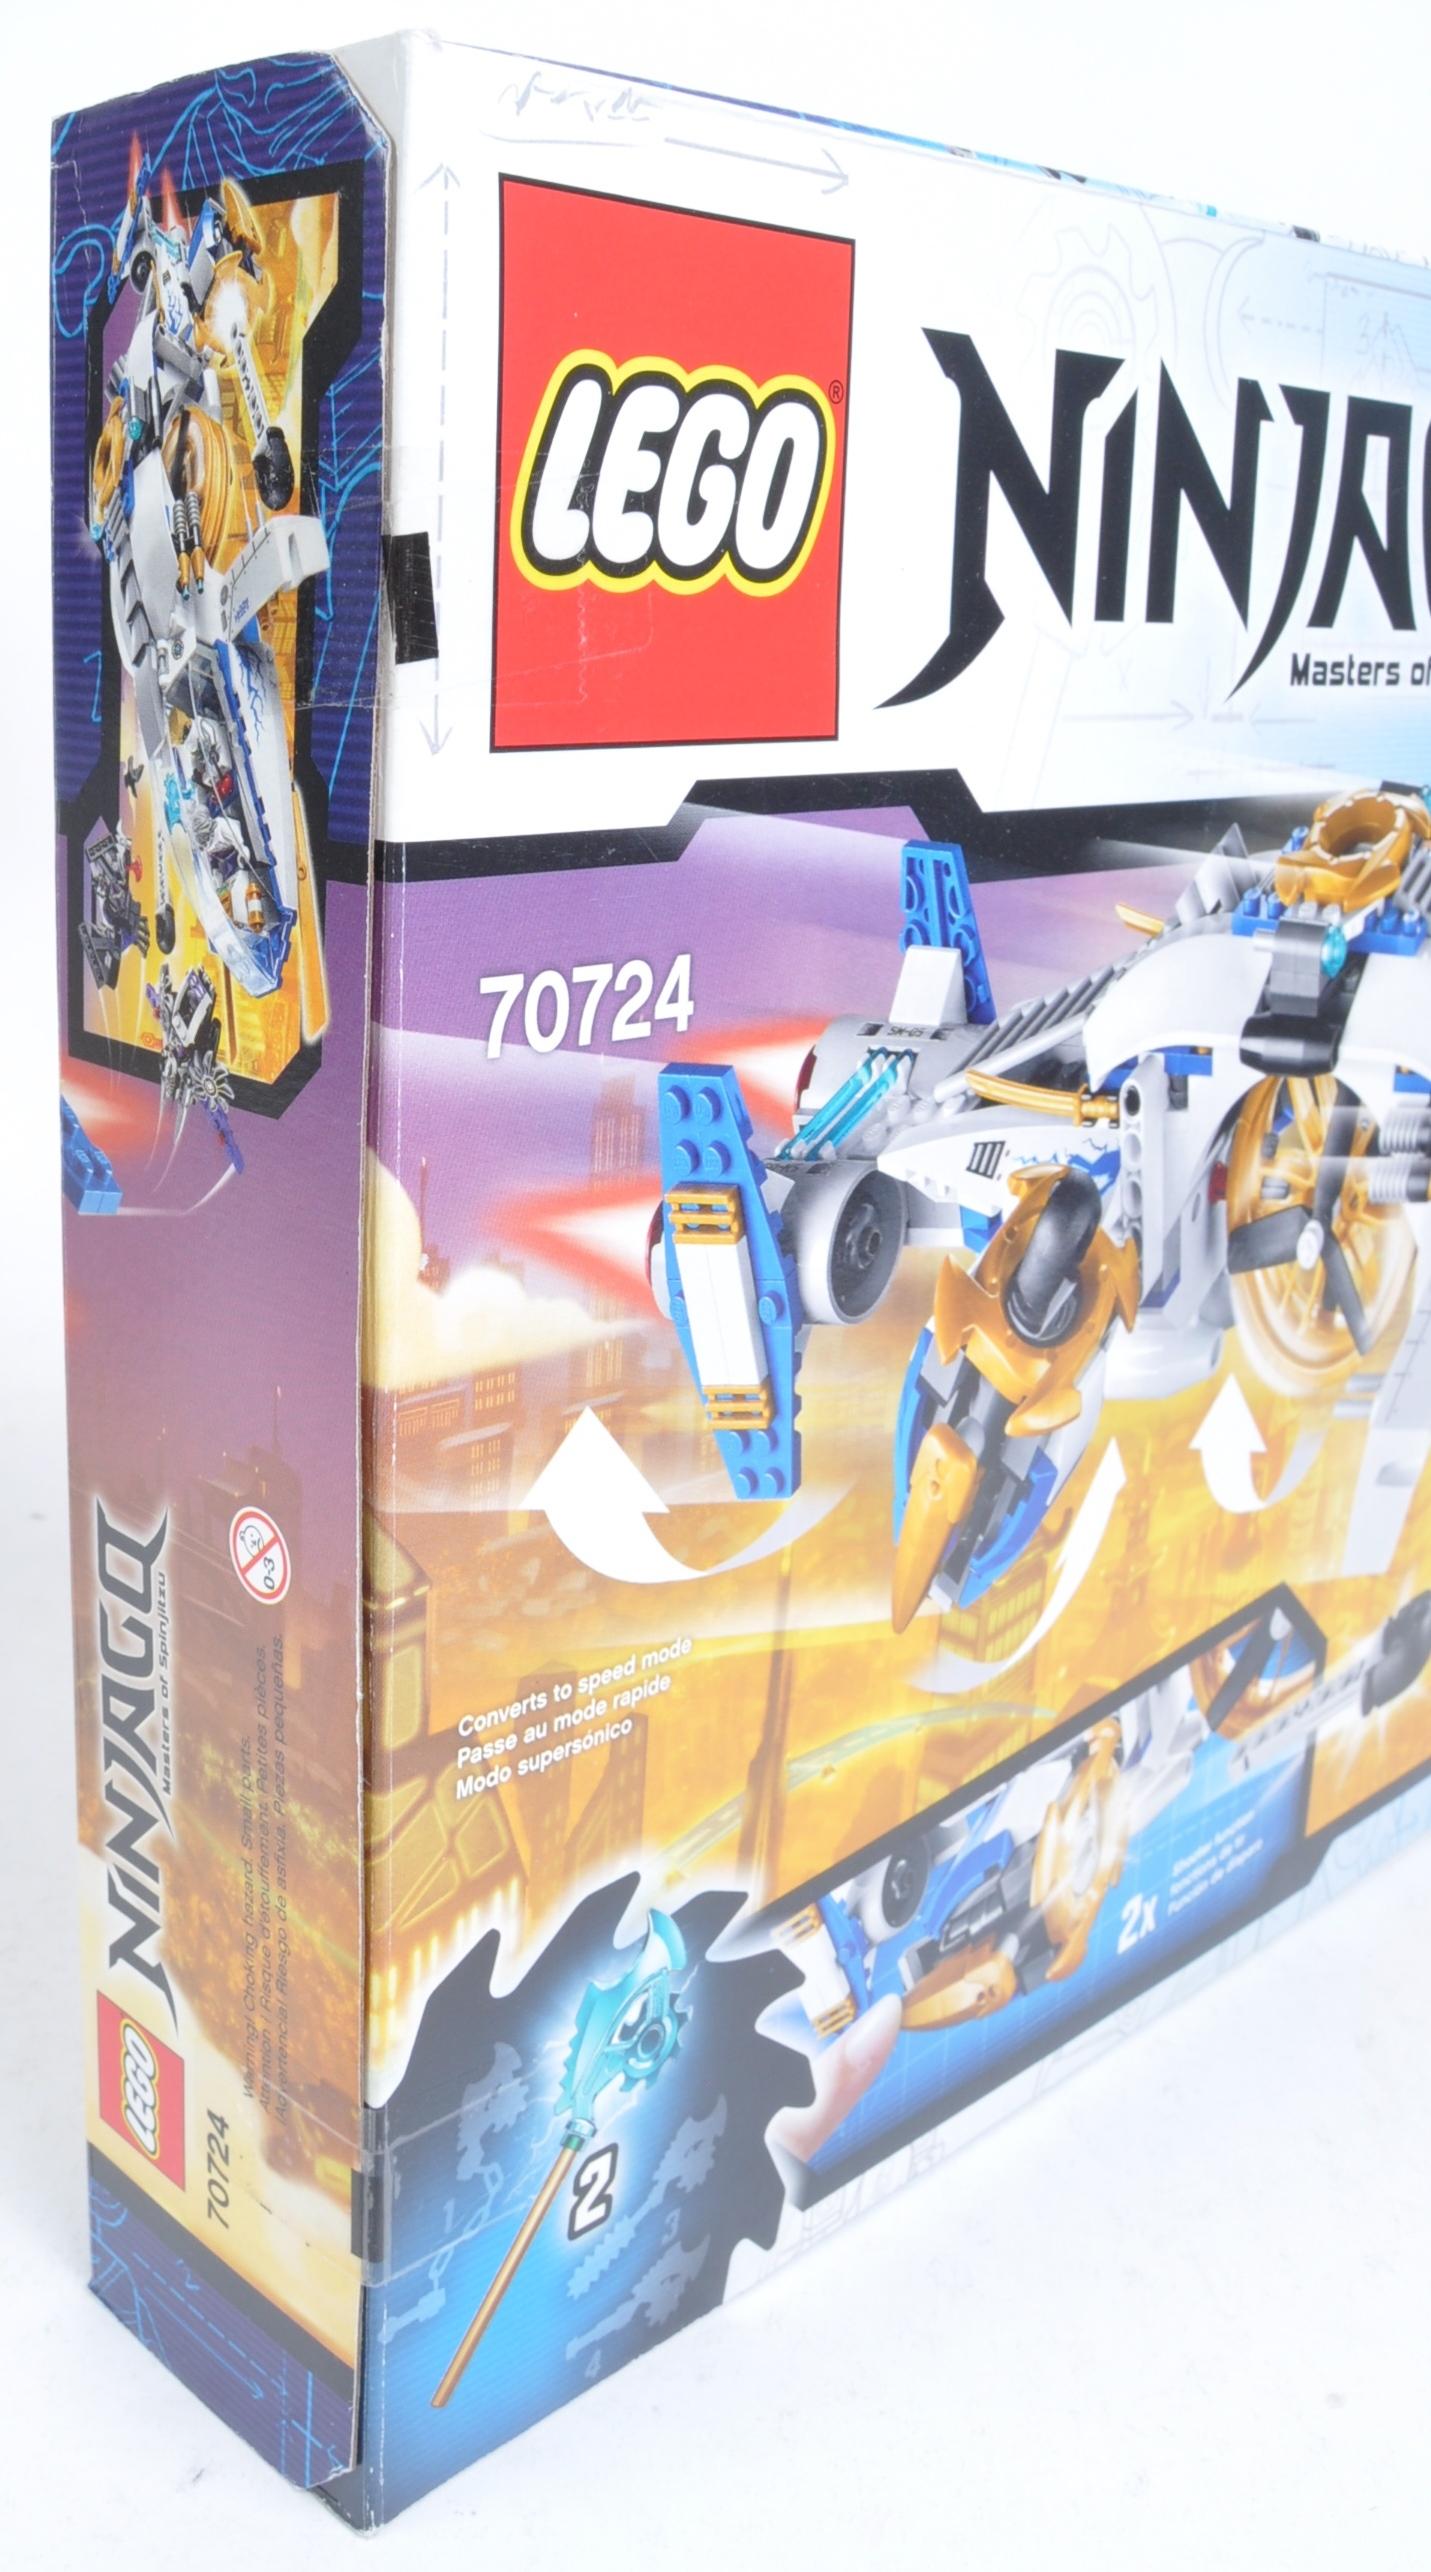 LEGO SETS - NINJAGO MASTERS OF SPINJITZU - 70722 / 70724 - Image 4 of 6